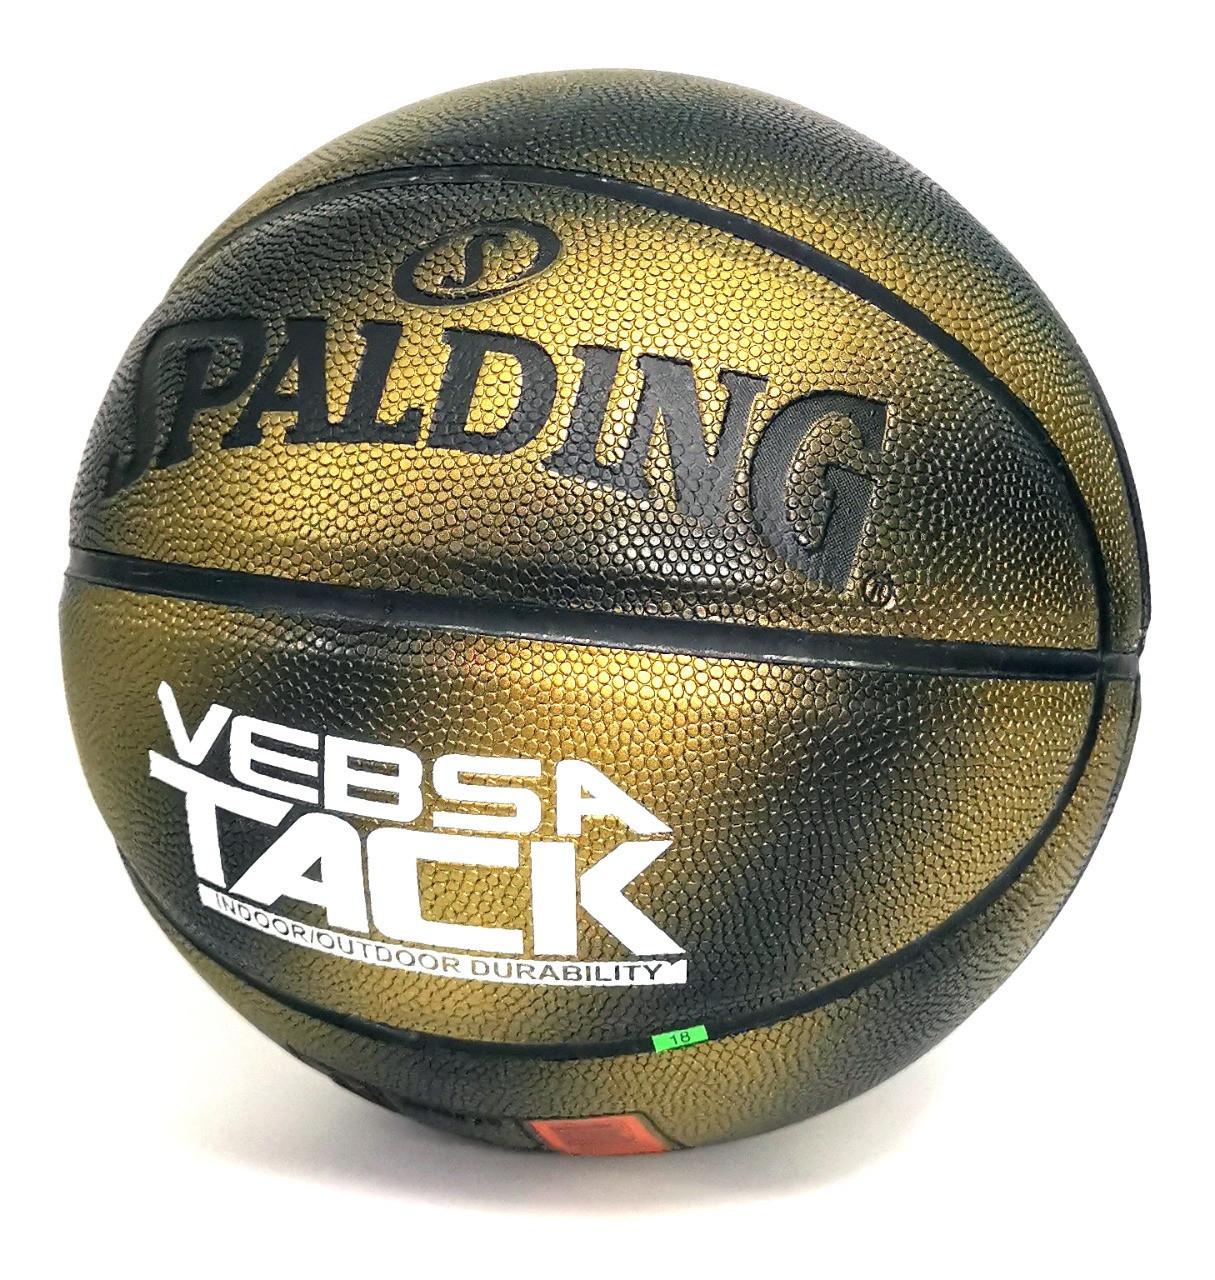 Мяч баскетбольный Spalding Vebsa Tack 40